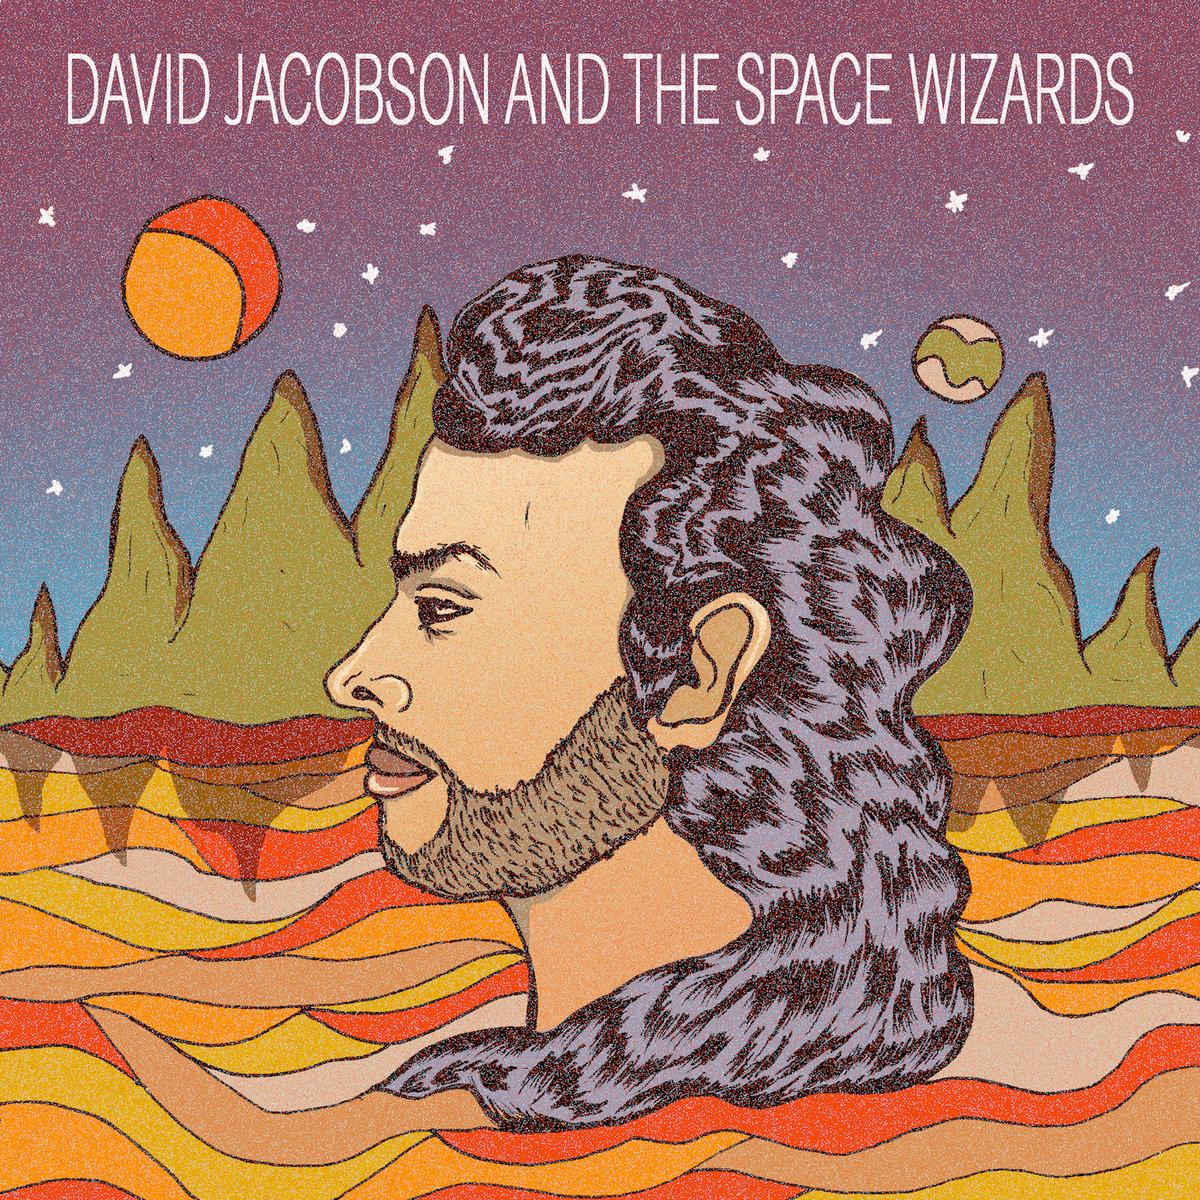 a song for kelly biro goodbye david jacobson